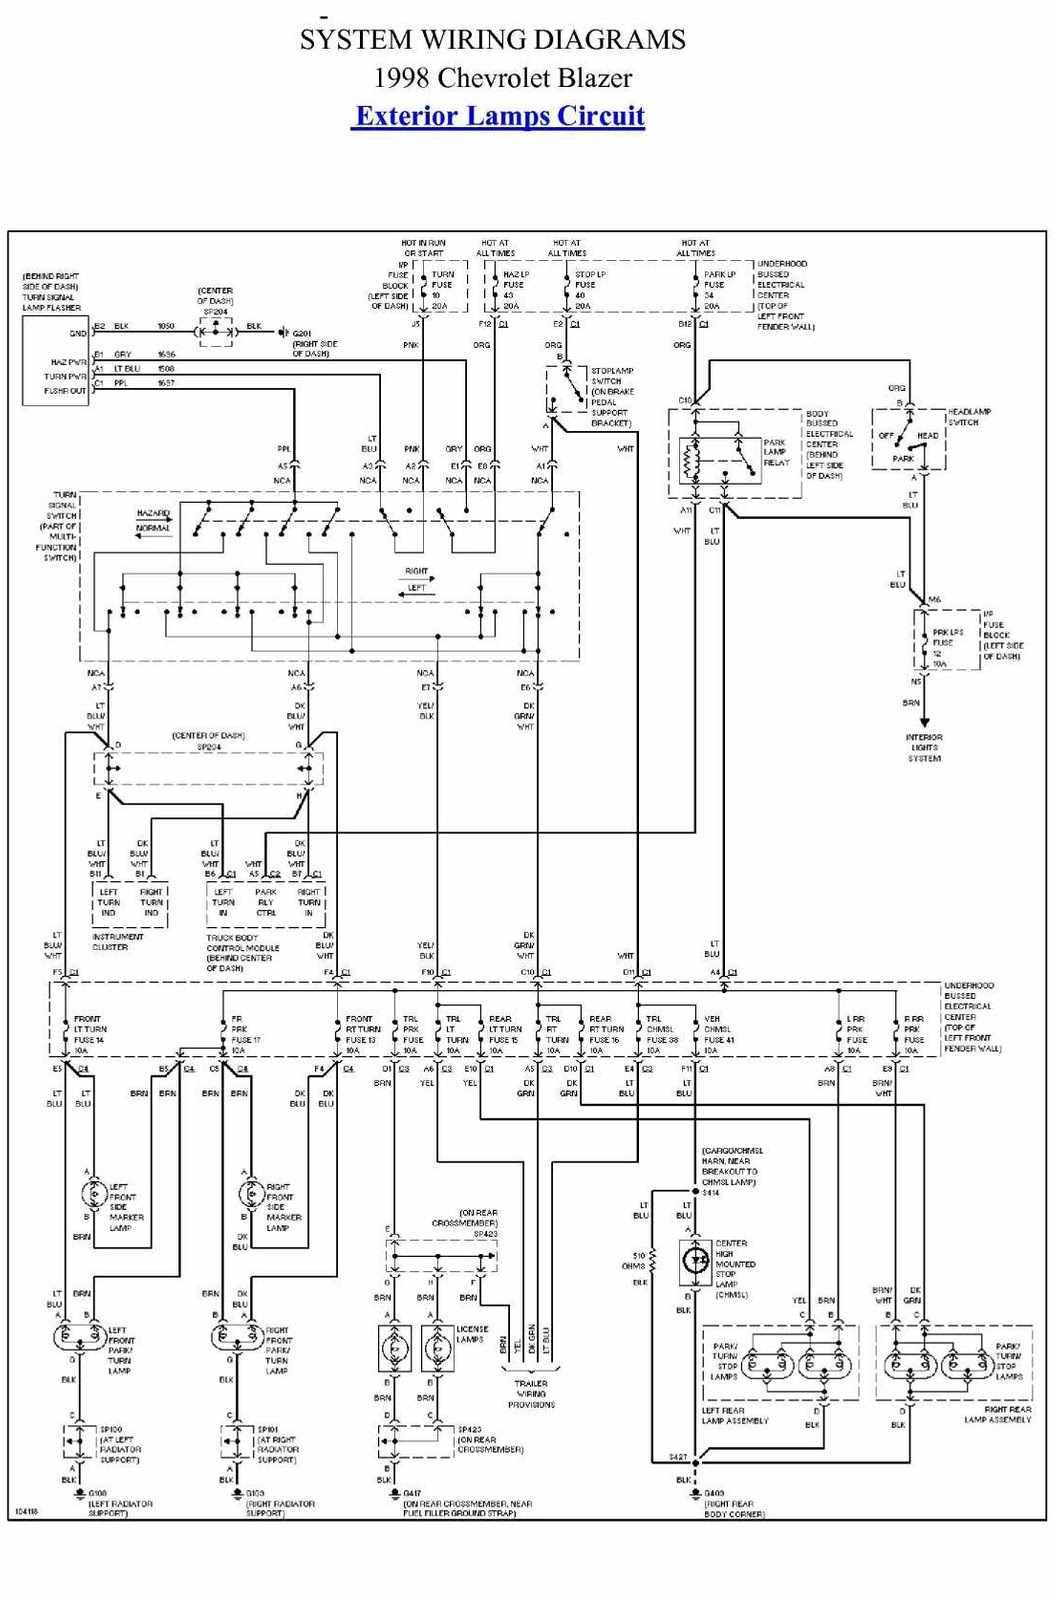 exterior lamp circuit diagram of 1998 chevrolet blazer [ 1056 x 1600 Pixel ]